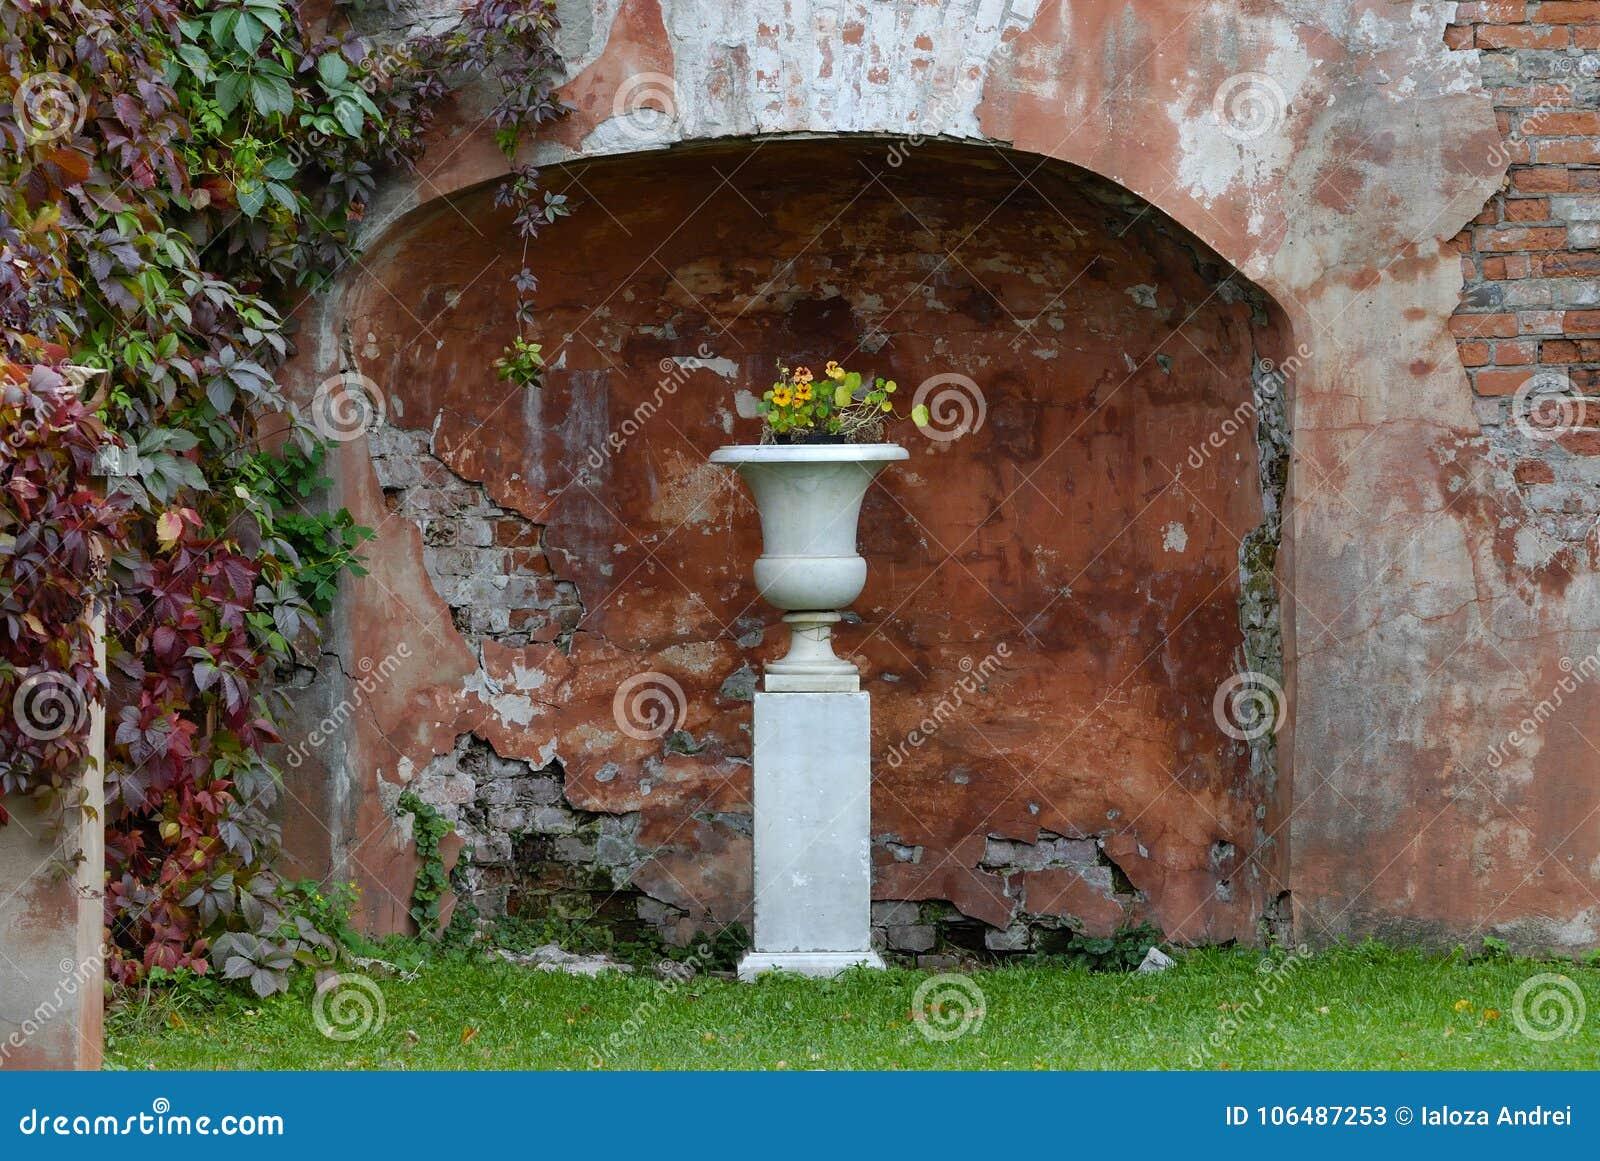 Flower Vase For Niches on bud vases, graveside vases, us metalcraft vases, floral vases, niche wall art, cemetery vases, niche flower holders,